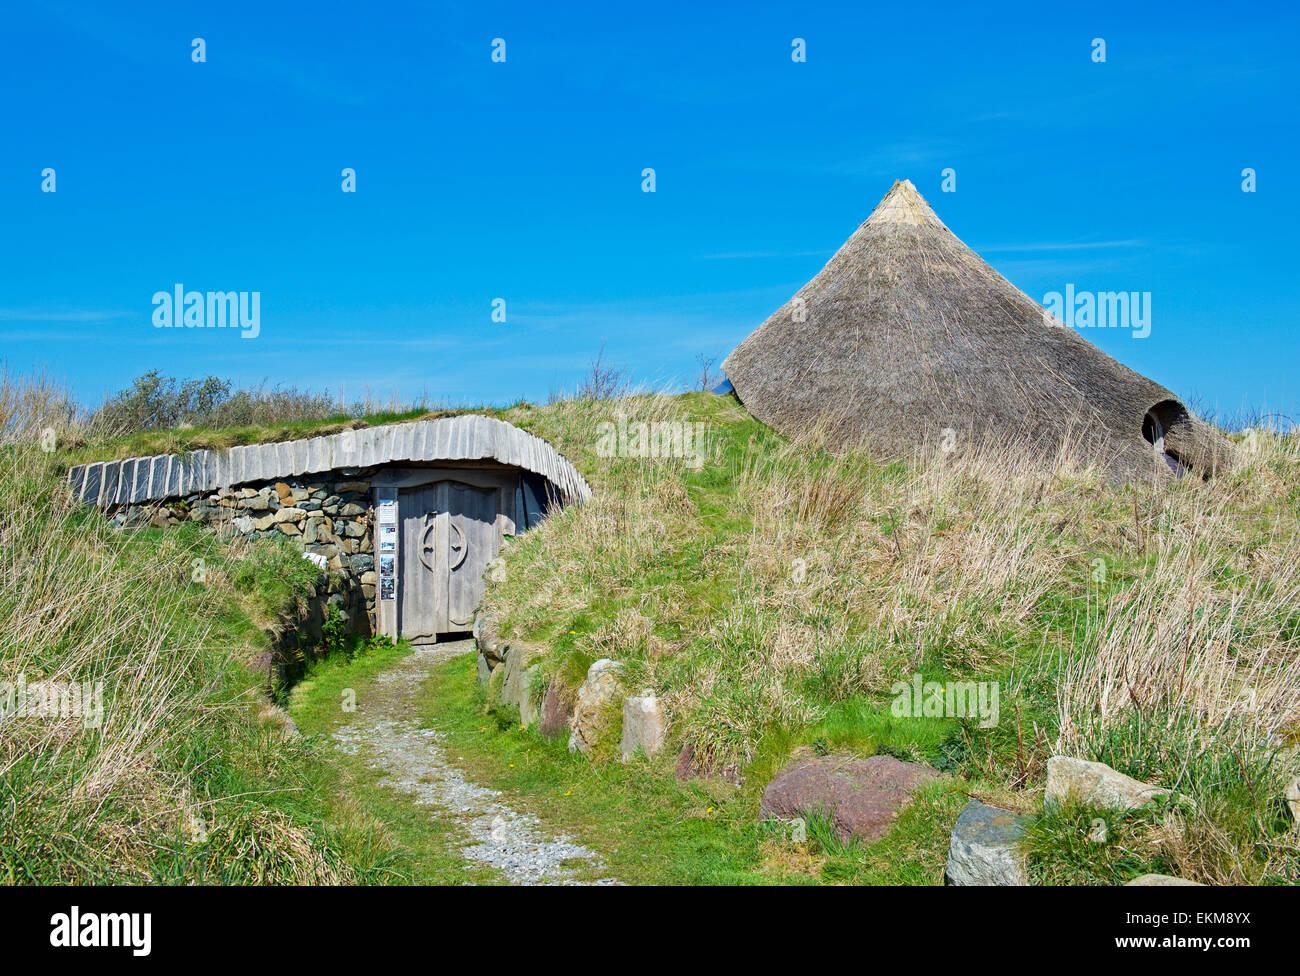 Roundhouse at the Felin Uchaf educational centre, Llyn Peninsular, Gwynedd, North Wales UK - Stock Image